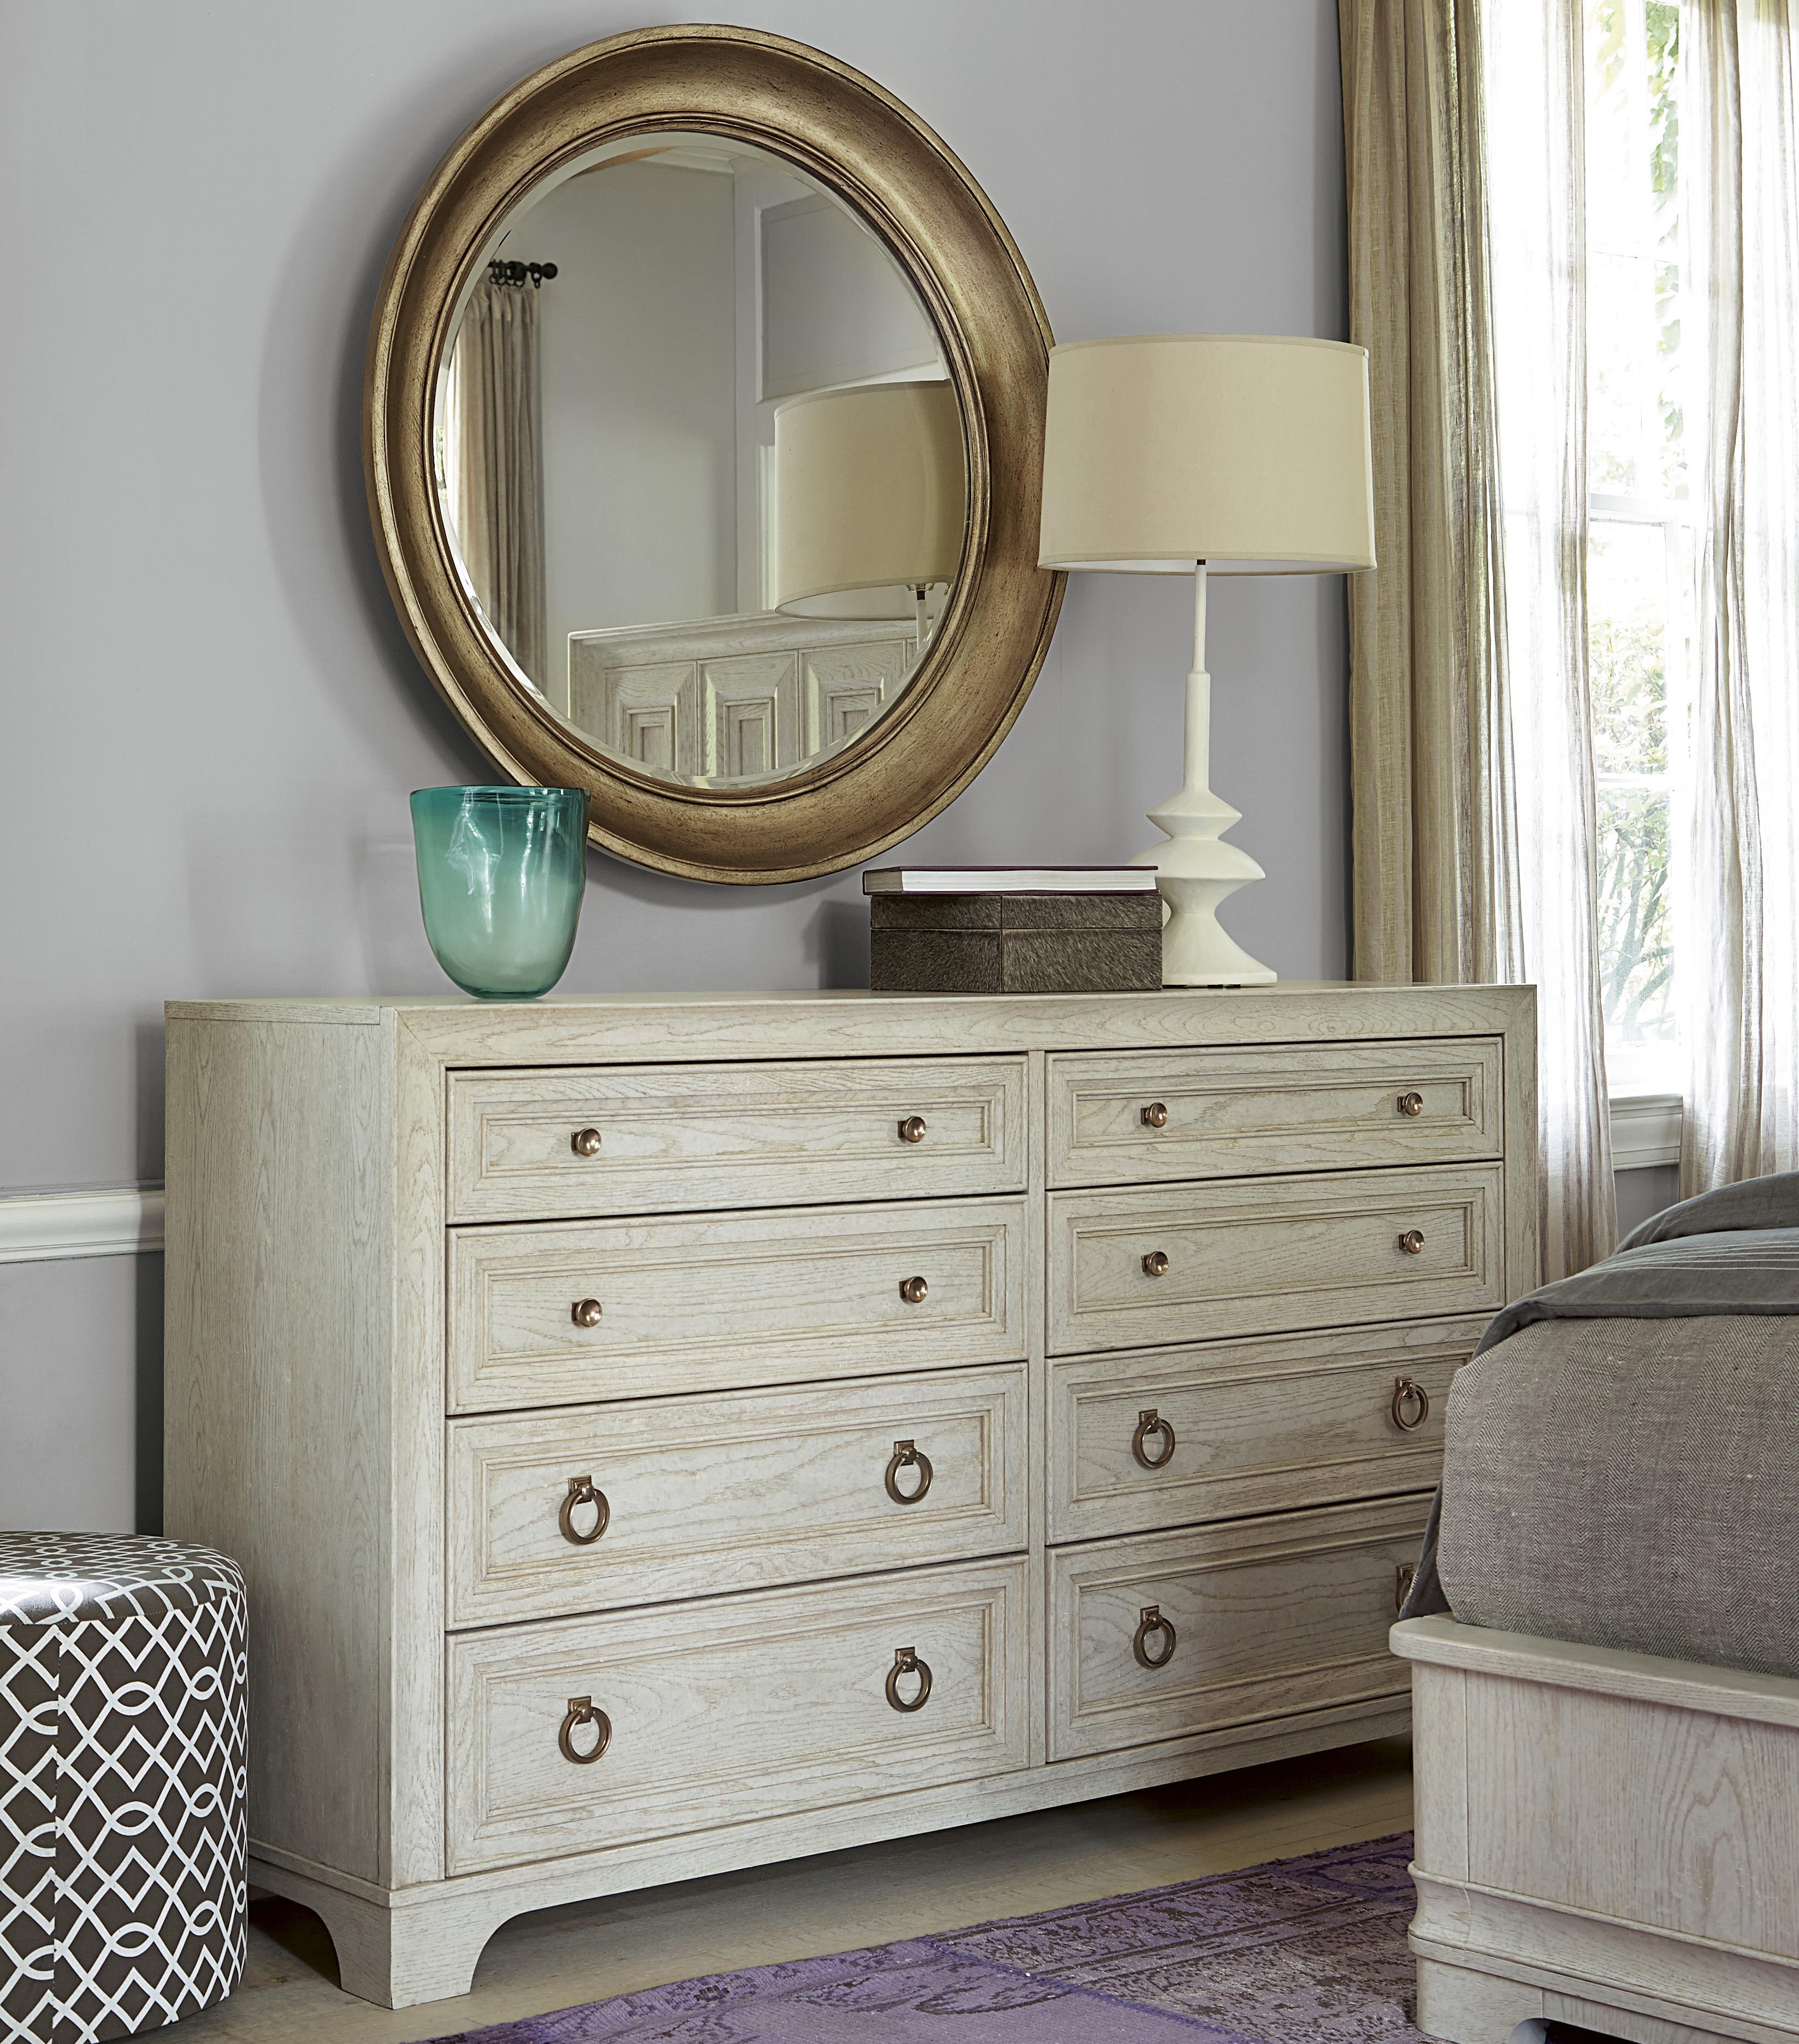 Universal California - Malibu Dresser and Mirror Set - Item Number: 476040+47509M